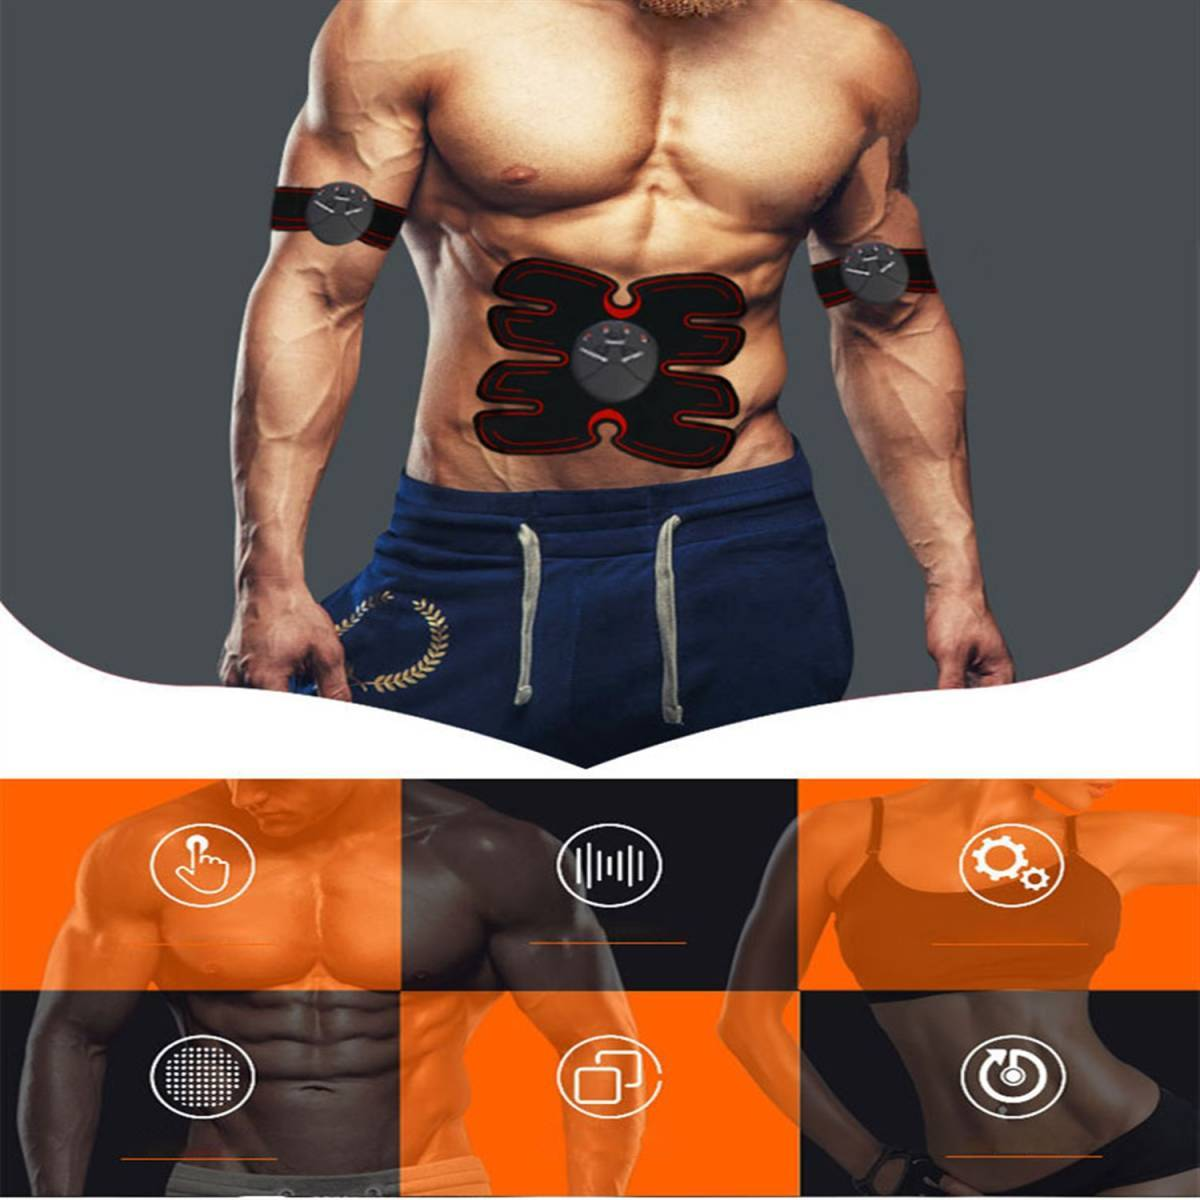 EMS 腹筋ベルト 腹筋マシーン 腹筋パッド 太もも 腕筋 筋トレ器具 ダイエット USB充電式 マッサージ エクササイズ 男女兼用 新品 _画像6